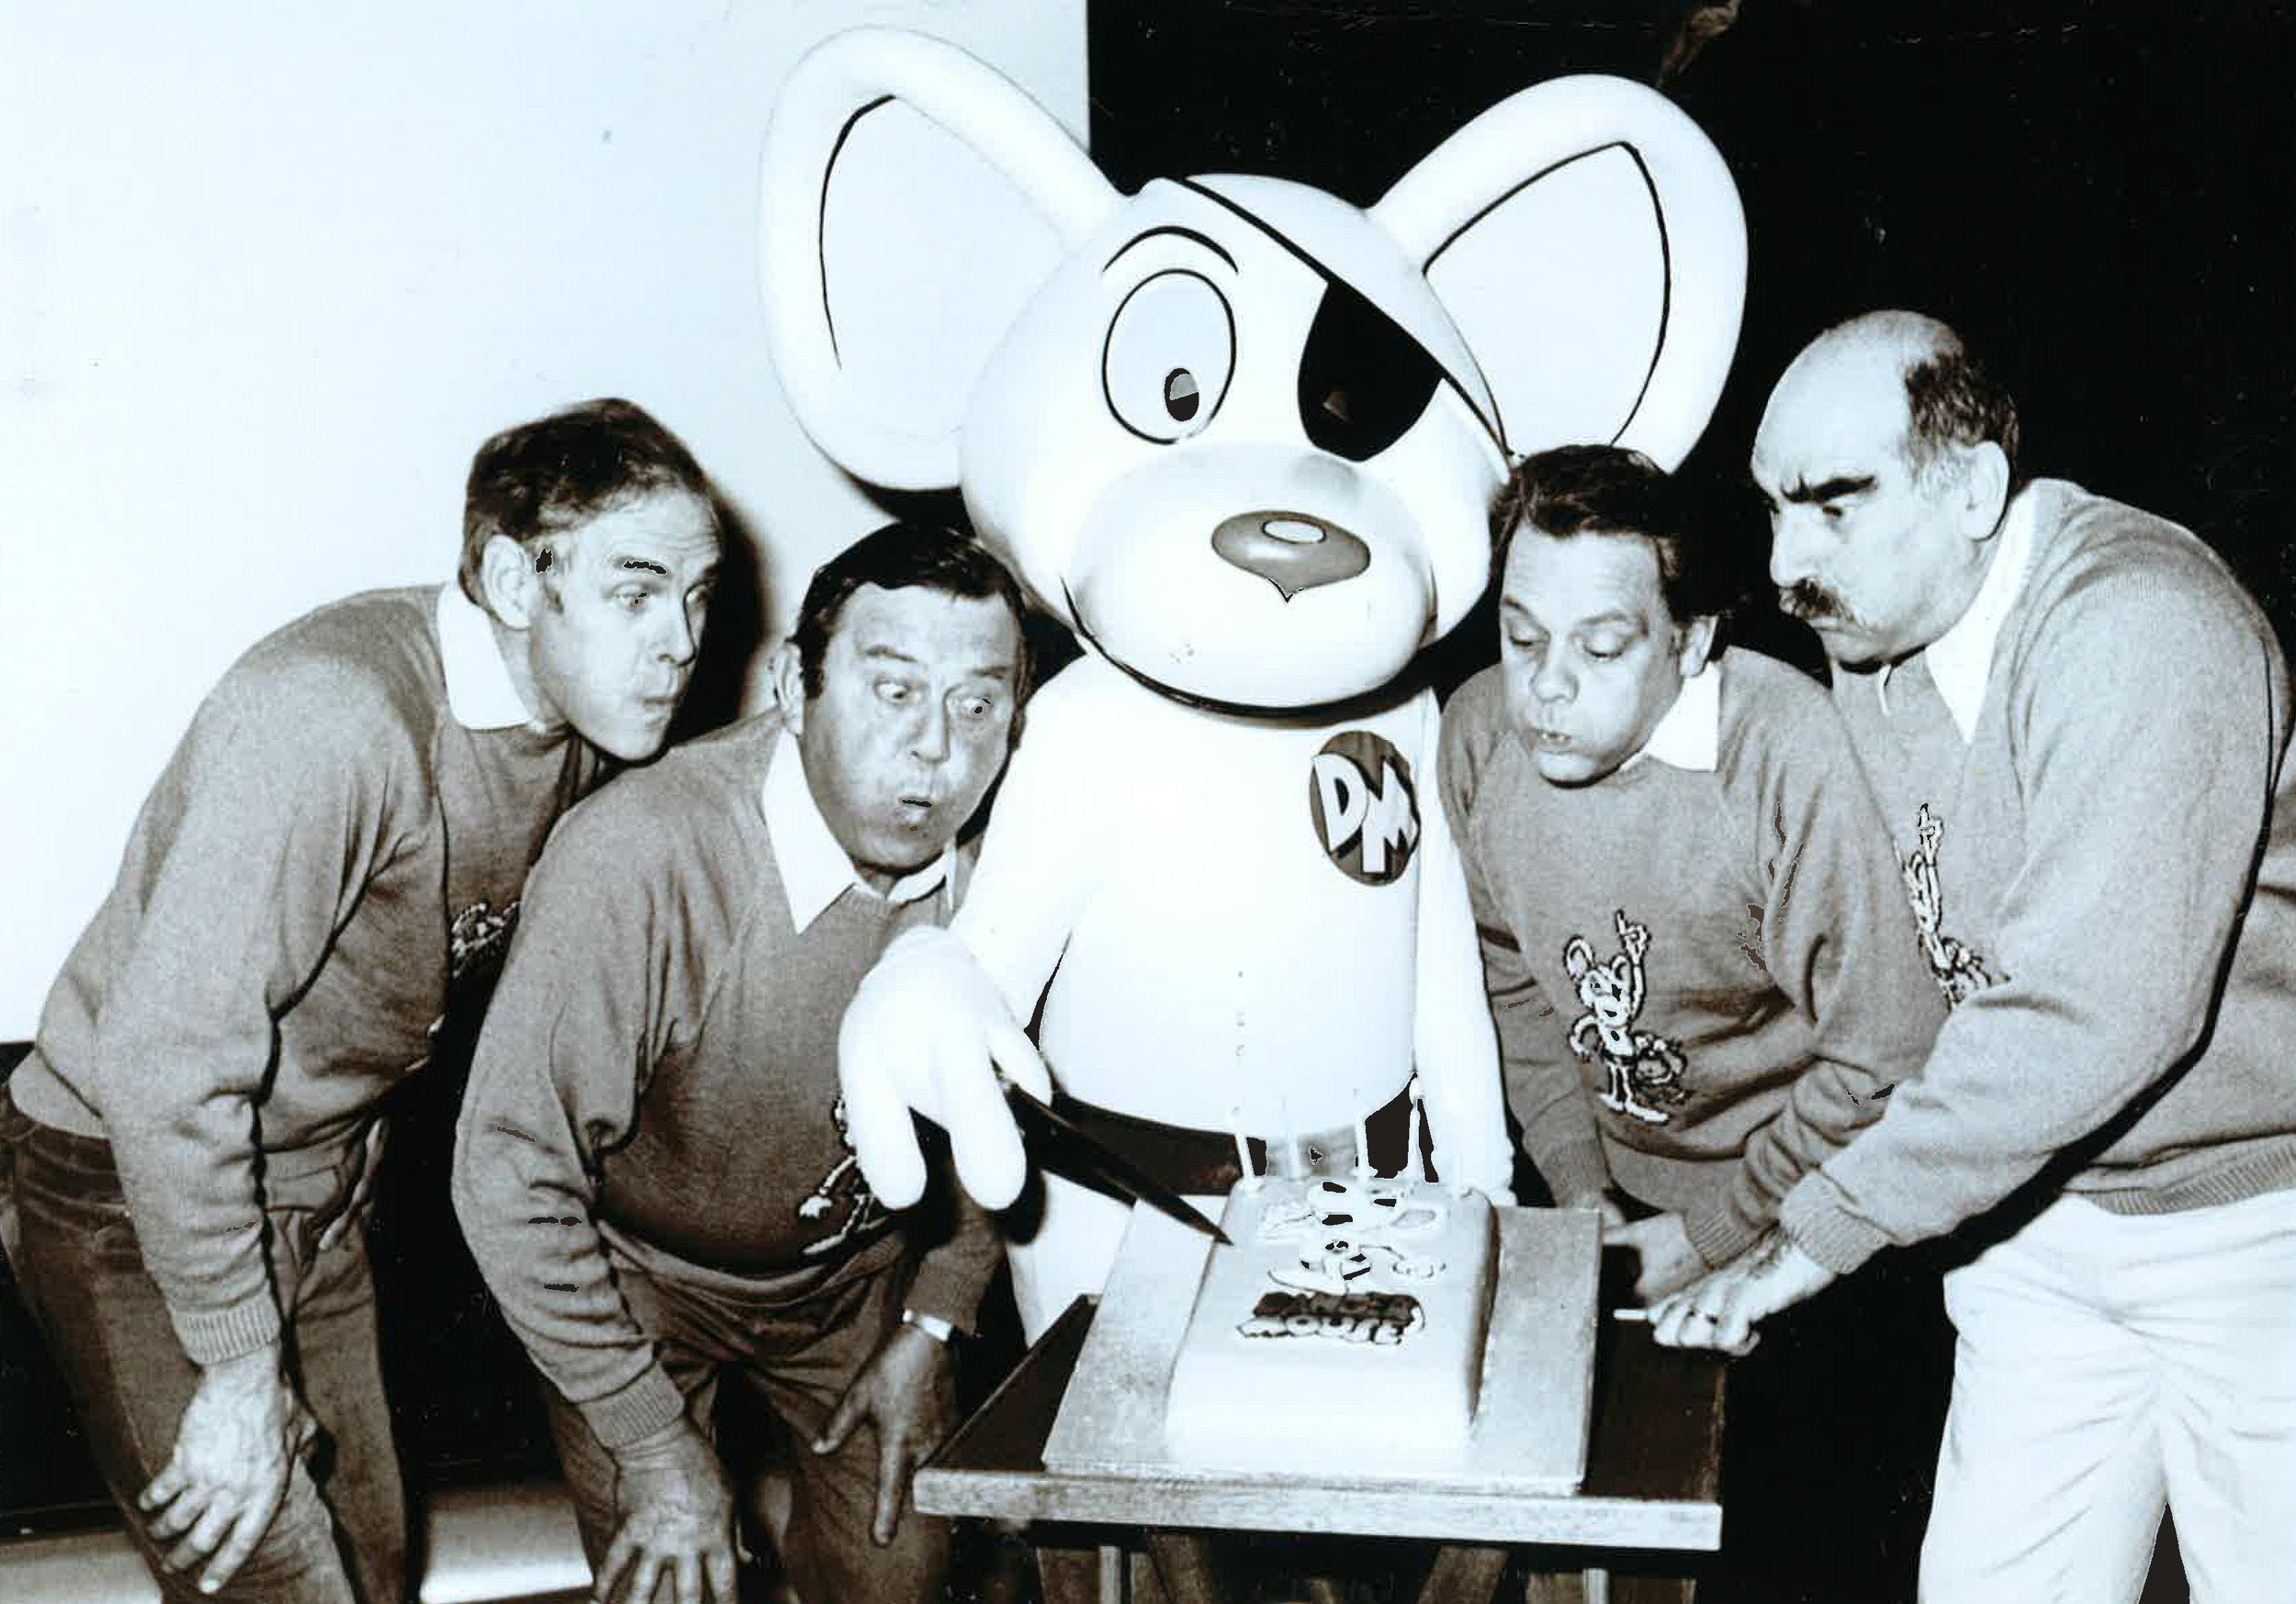 Brian Trueman, Terry Scott, Dangermouse, David Jason and Edward Kelsey. Image courtesy of Brian Cosgrove